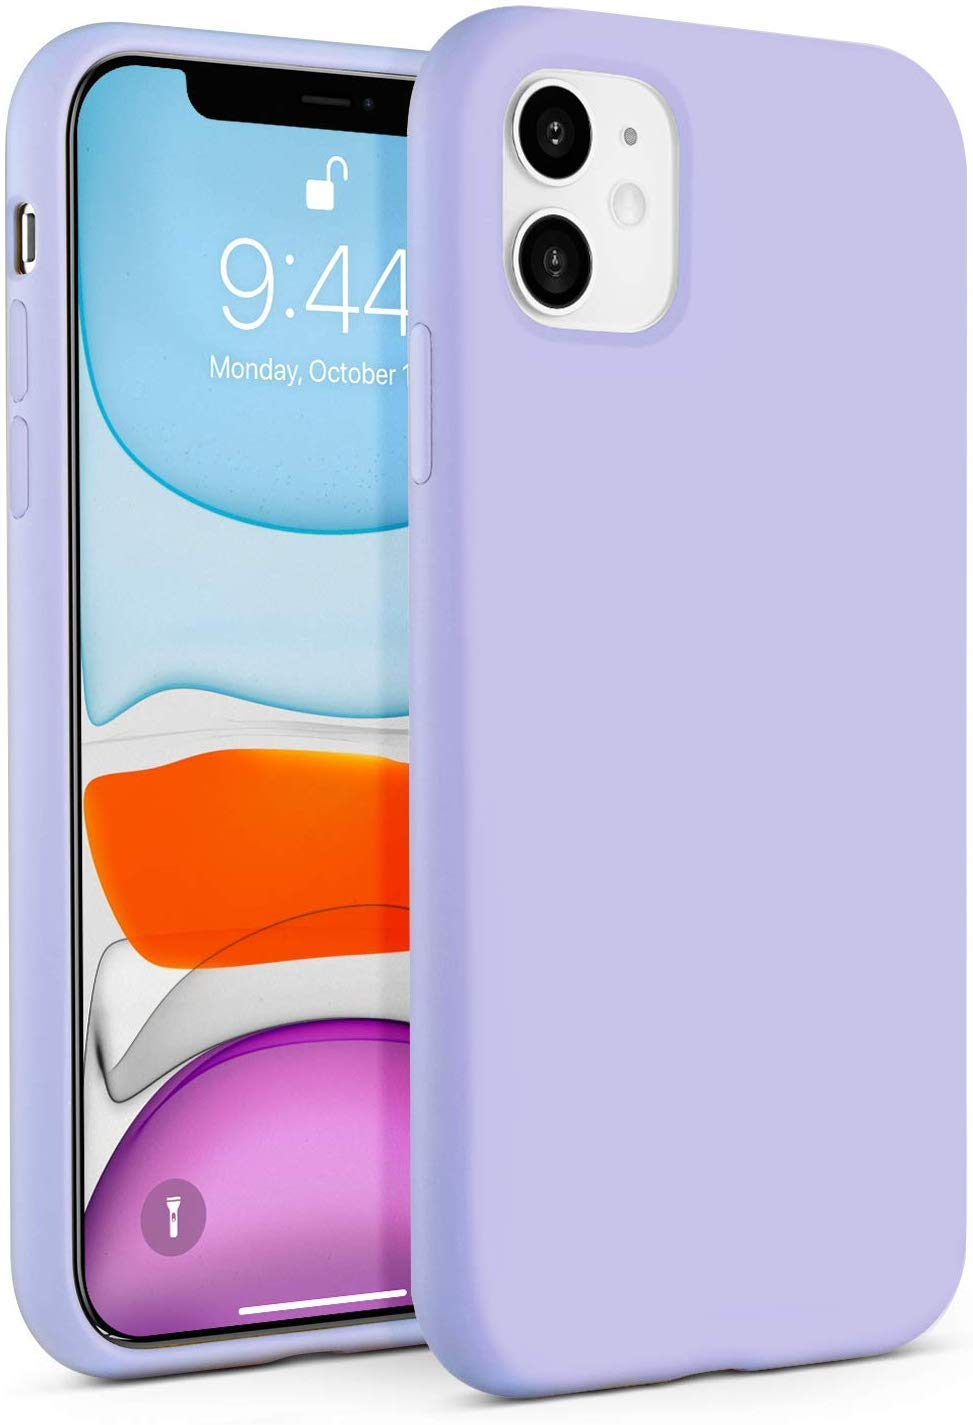 "IceSword iPhone 11 Case, Purple iPhone 11 Silicone Case, Gel Rubber Full Body, iPhone 11 Cute iPhone 11 case, Soft Microfiber Cloth, 6.1"" iPhone 11 case Silicone, iPhone 11 case Cute - Purple"